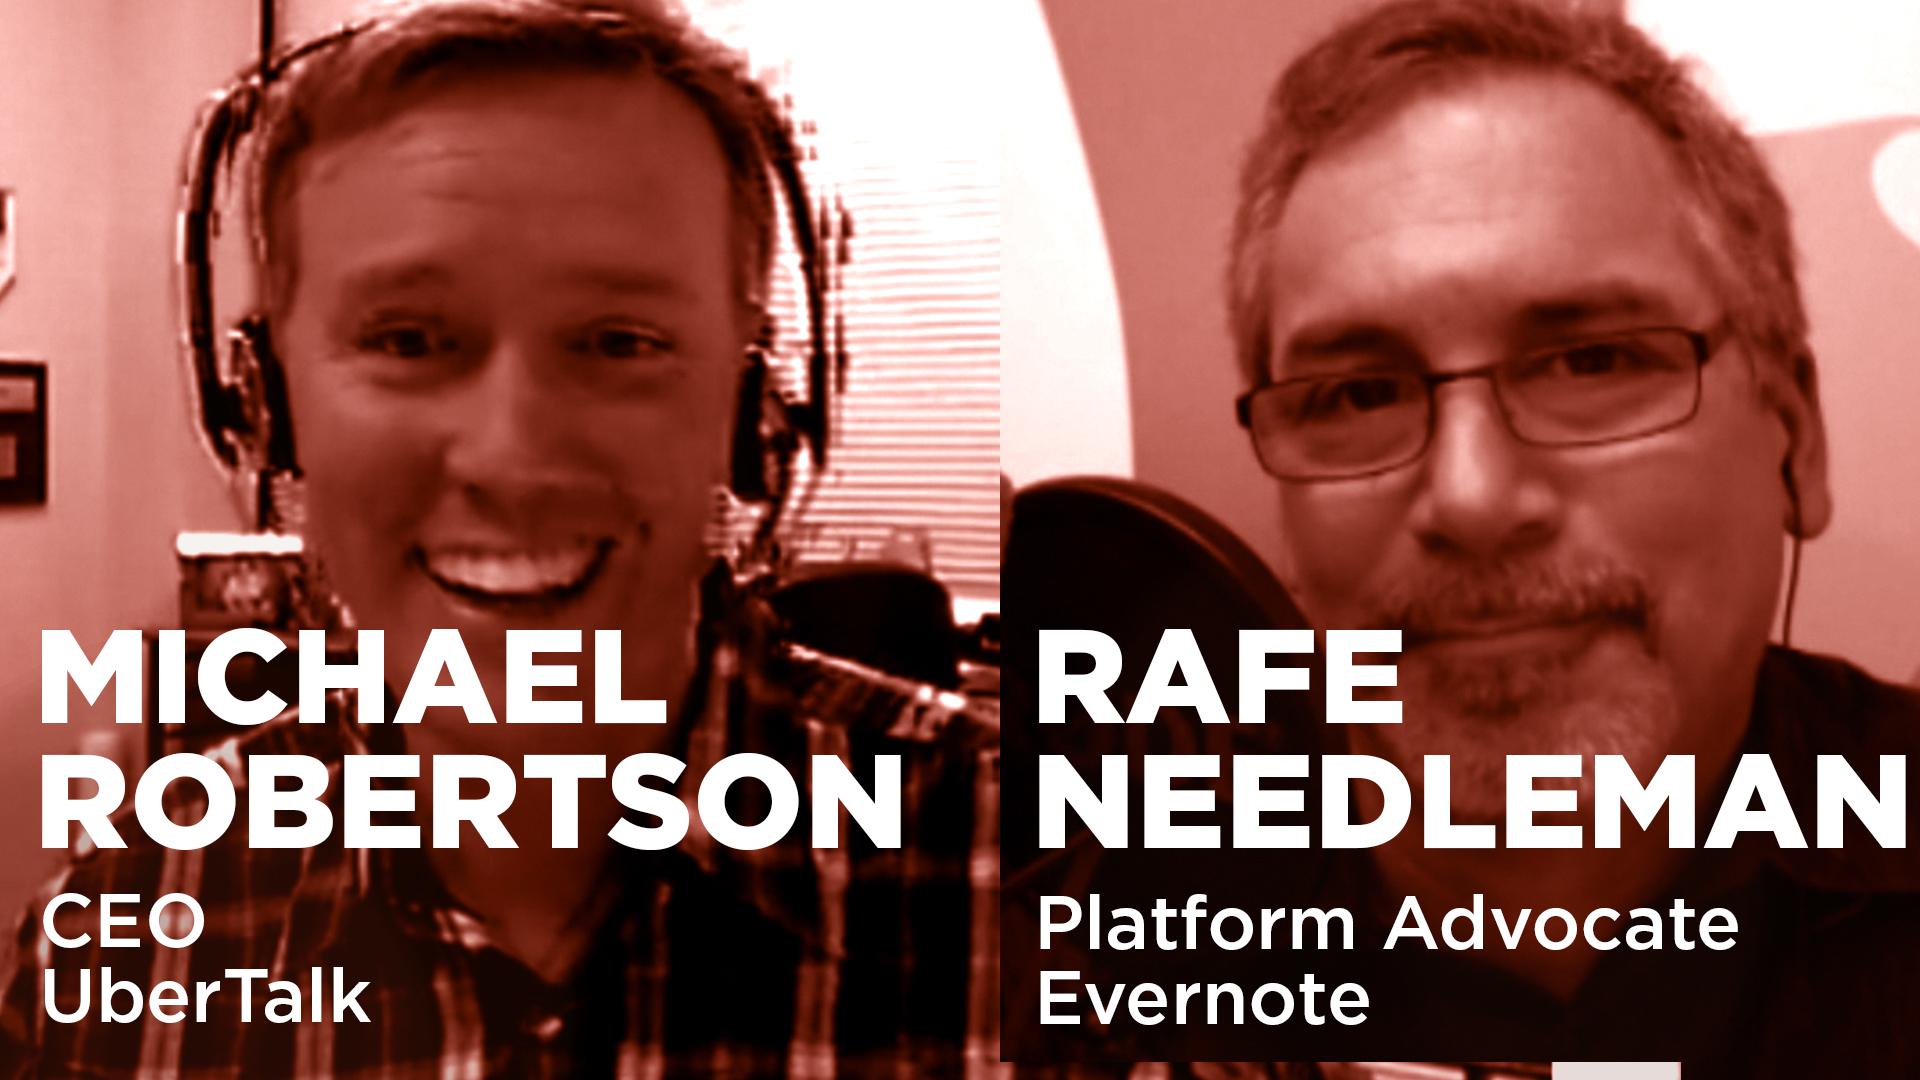 News Roundtable with Rafe Needleman and Michael Robertson